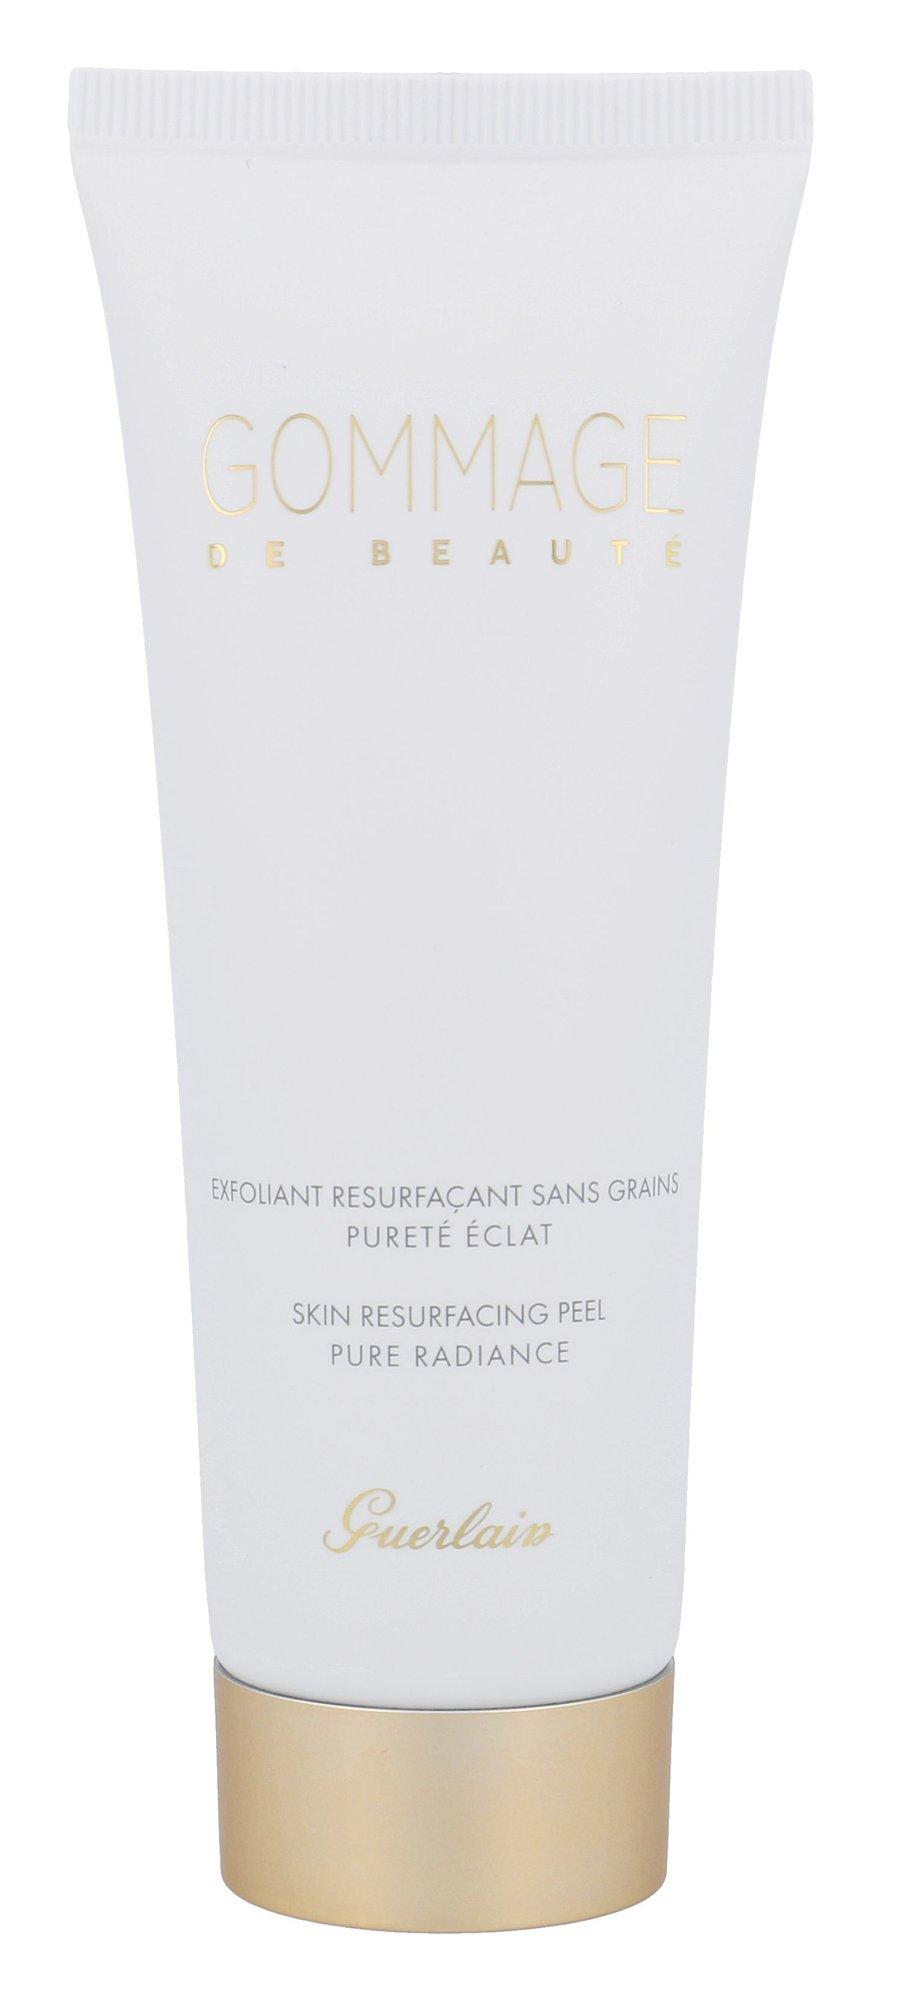 Guerlain Gommage De Beauté Skin Resurfacing Peel Cosmetic 75ml